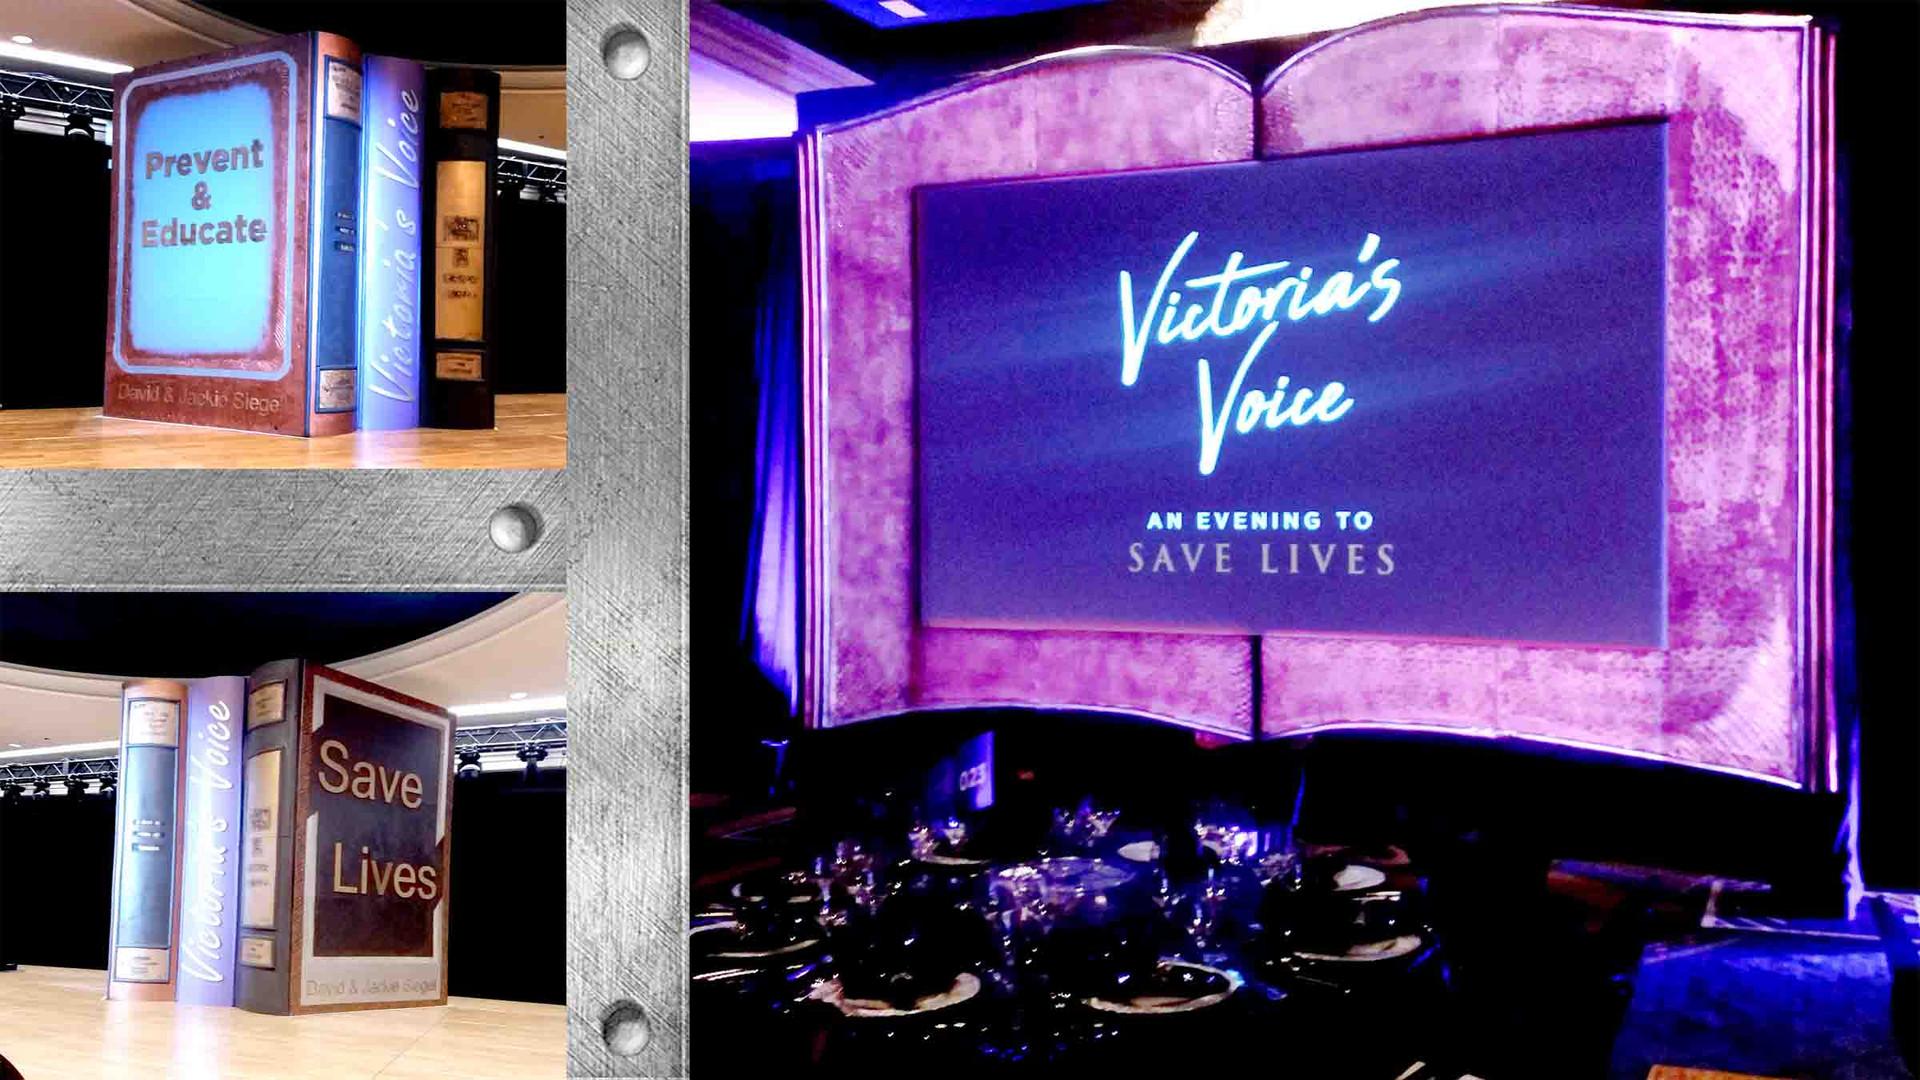 Victori's Voice Gala Load in 05_50%.jpg